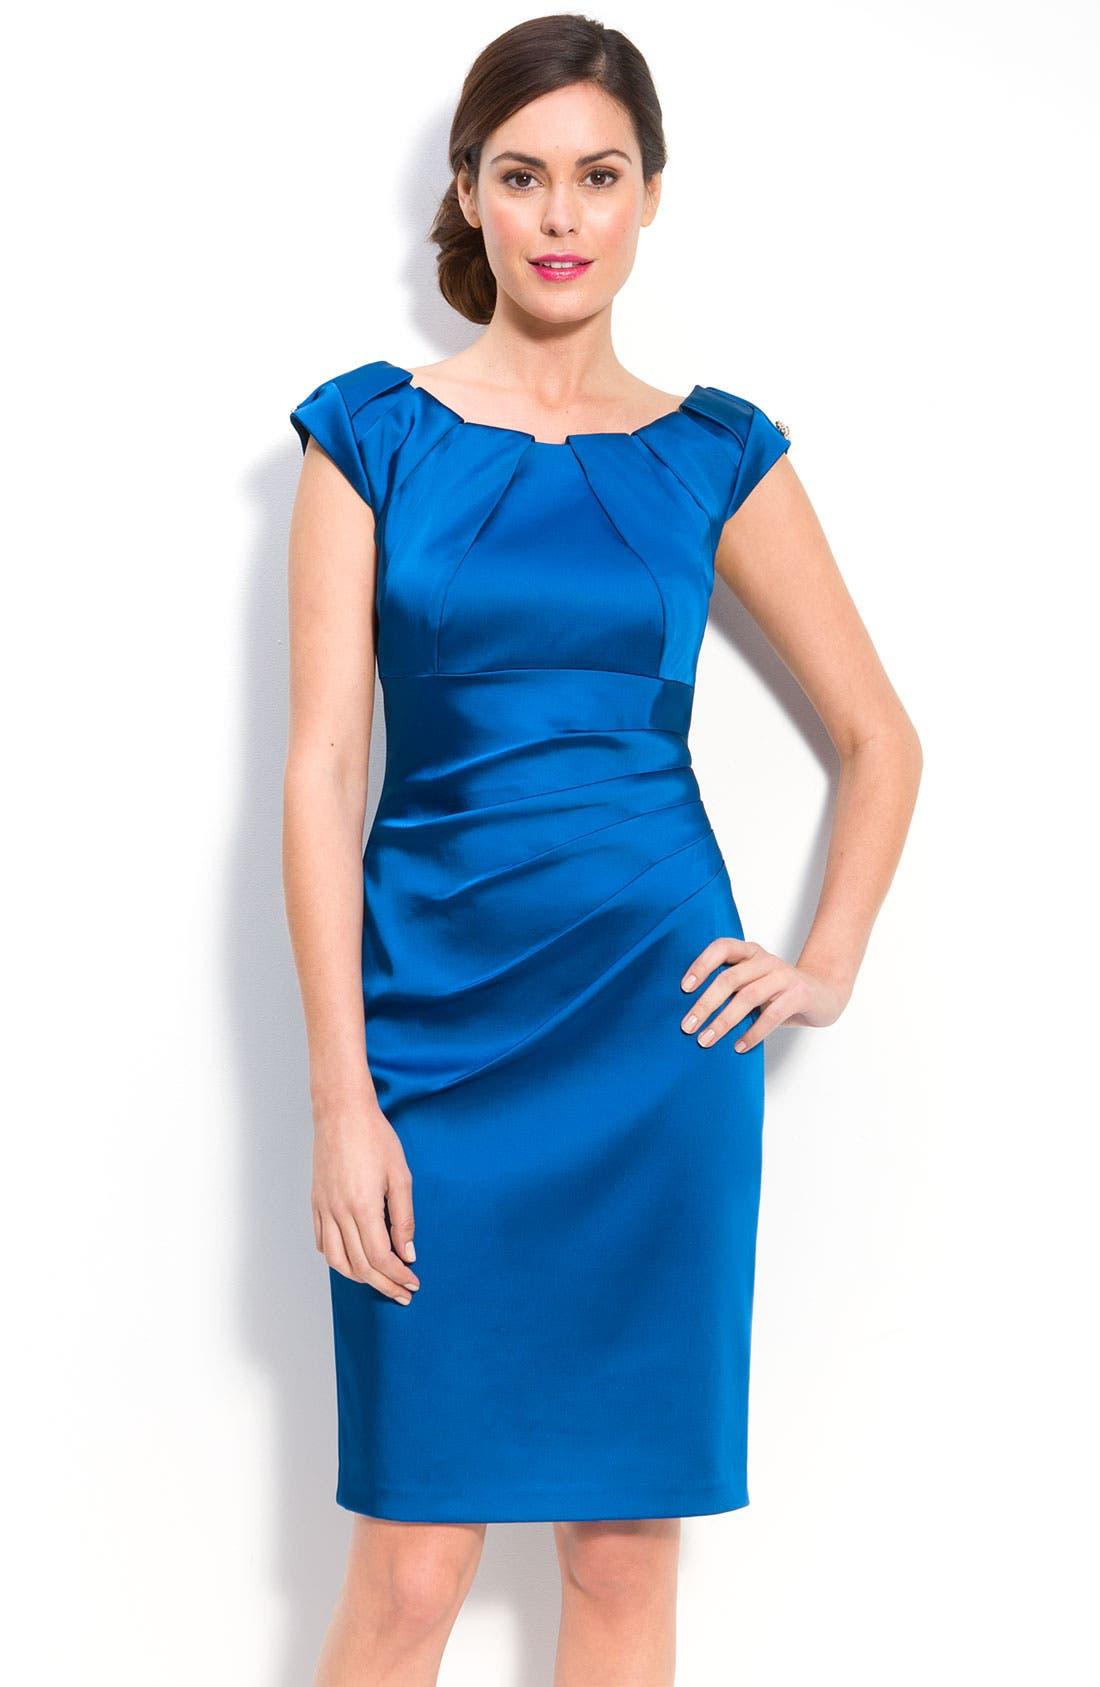 Pleat Neck Stretch Satin Sheath Dress,                             Main thumbnail 1, color,                             460